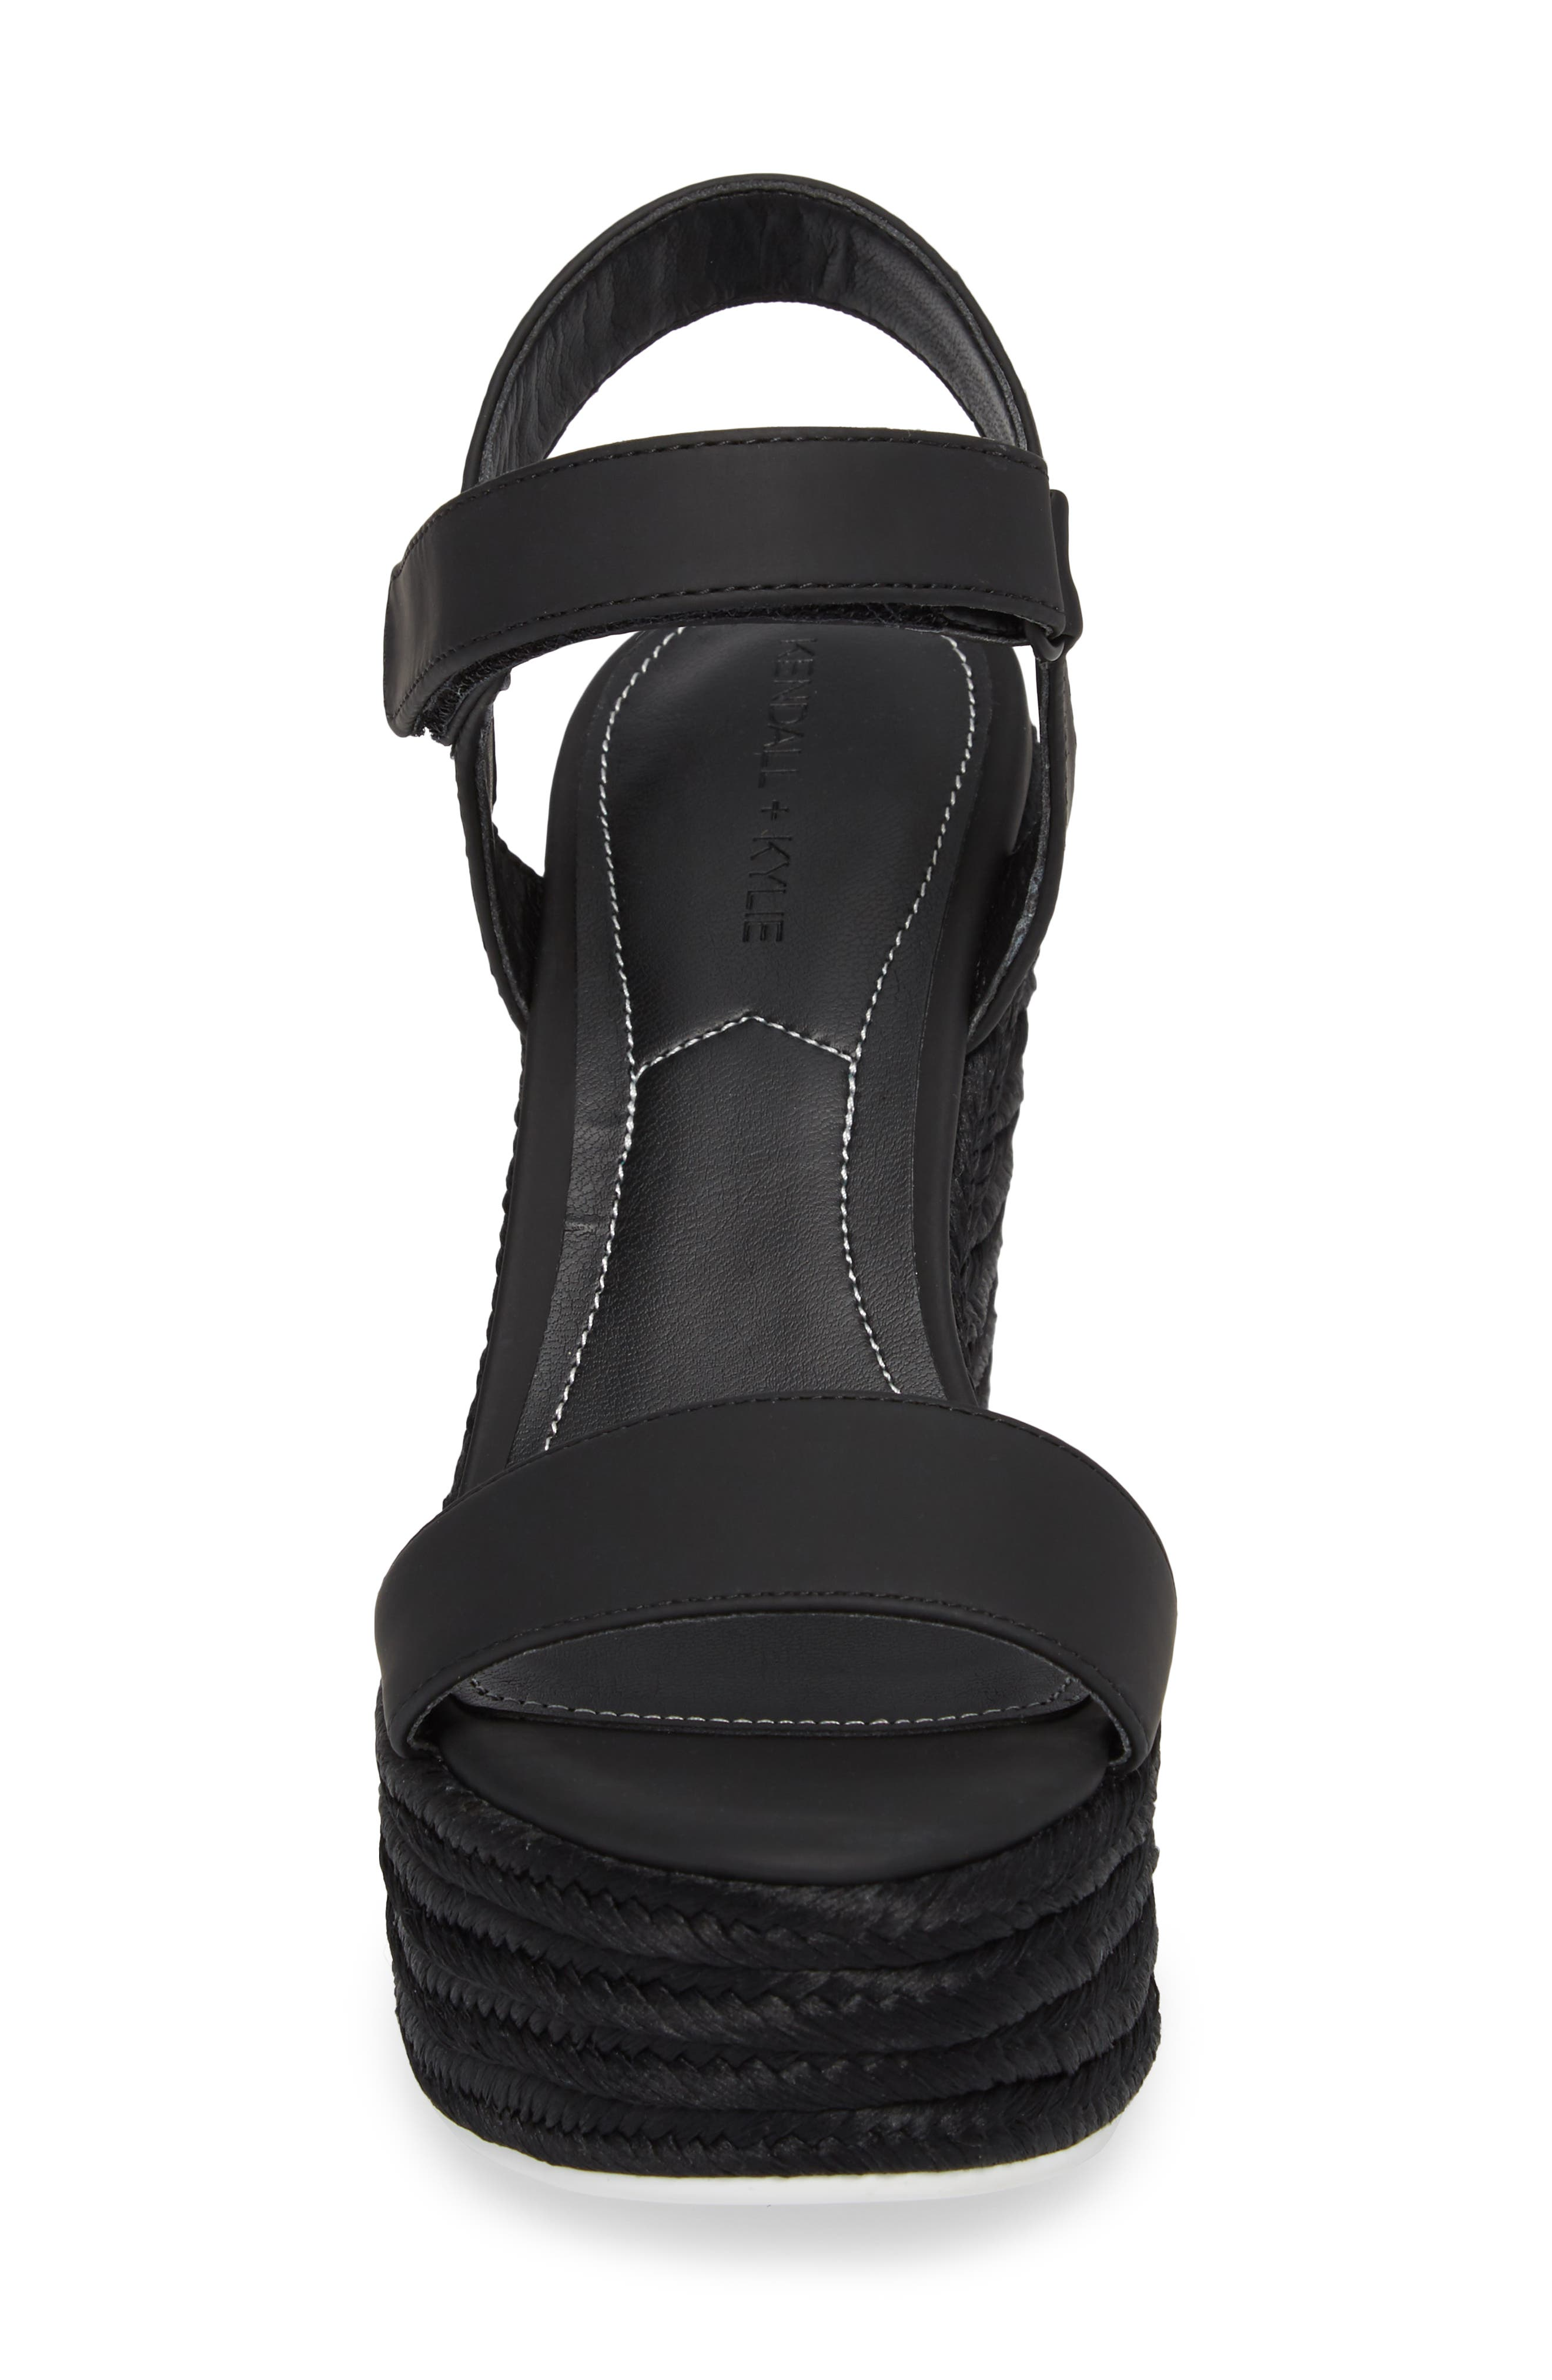 Grand Sport Espadrille Wedge Sandal,                             Alternate thumbnail 4, color,                             BLACK